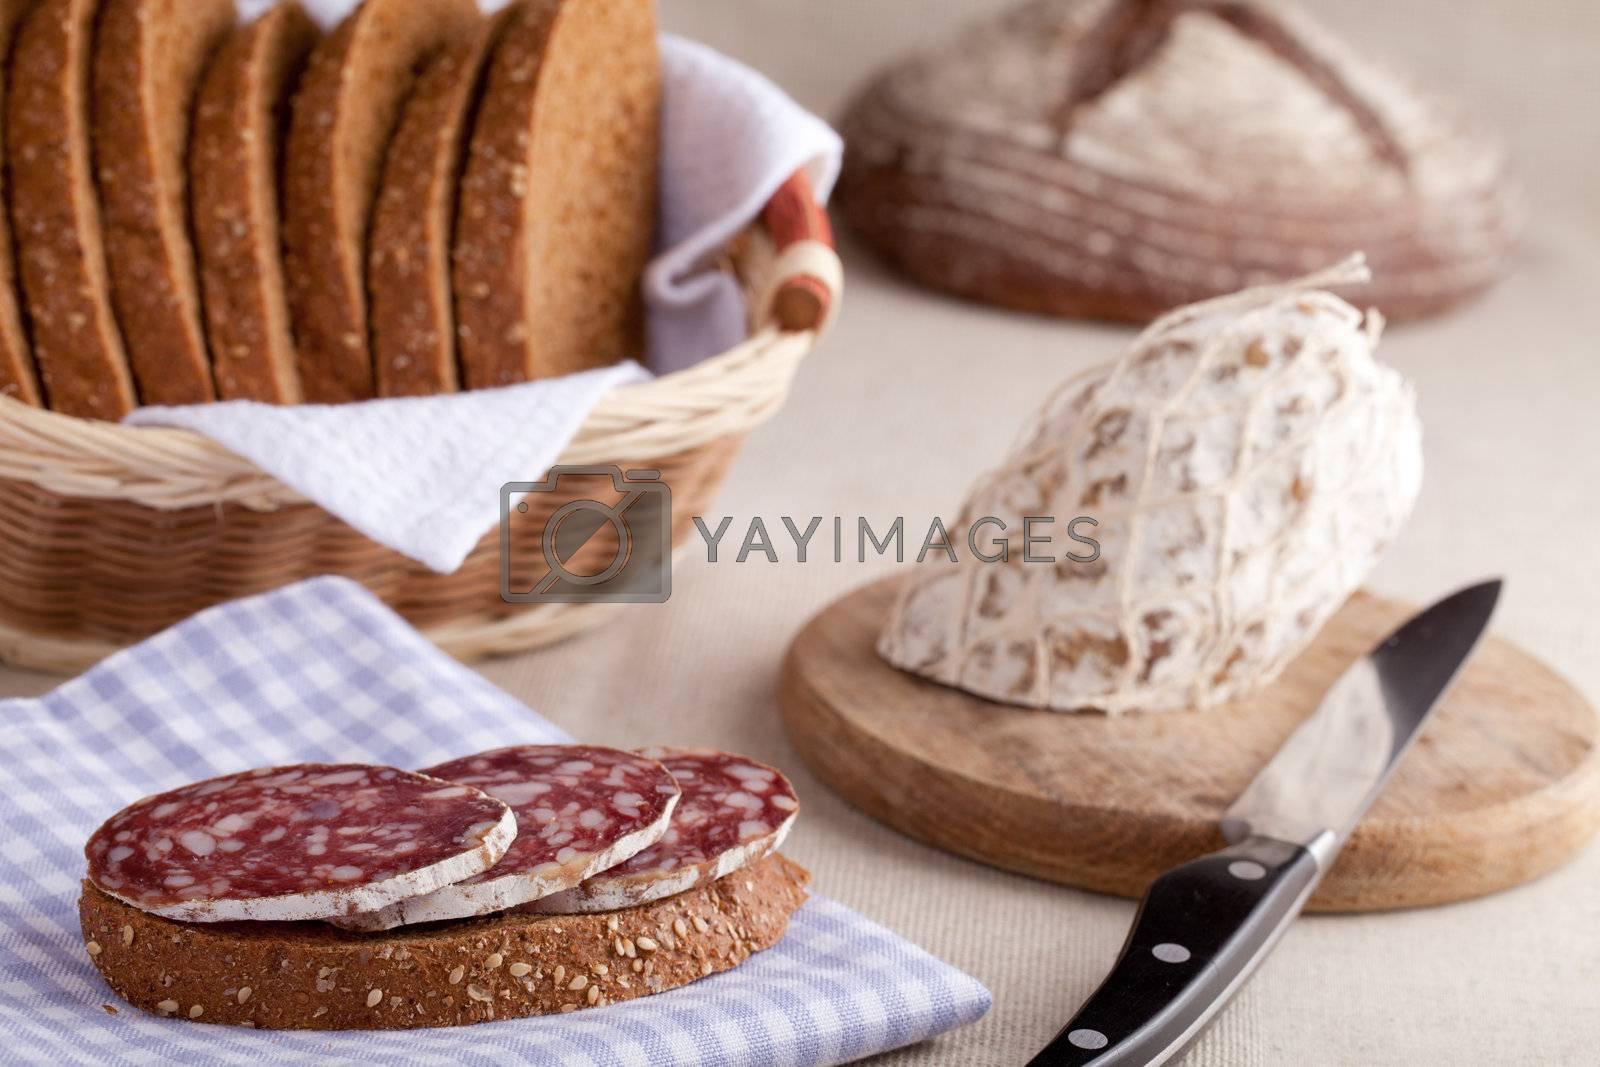 Served kitchen table, sandwich on napkin, salami, breadbasket, s by SergeyAK